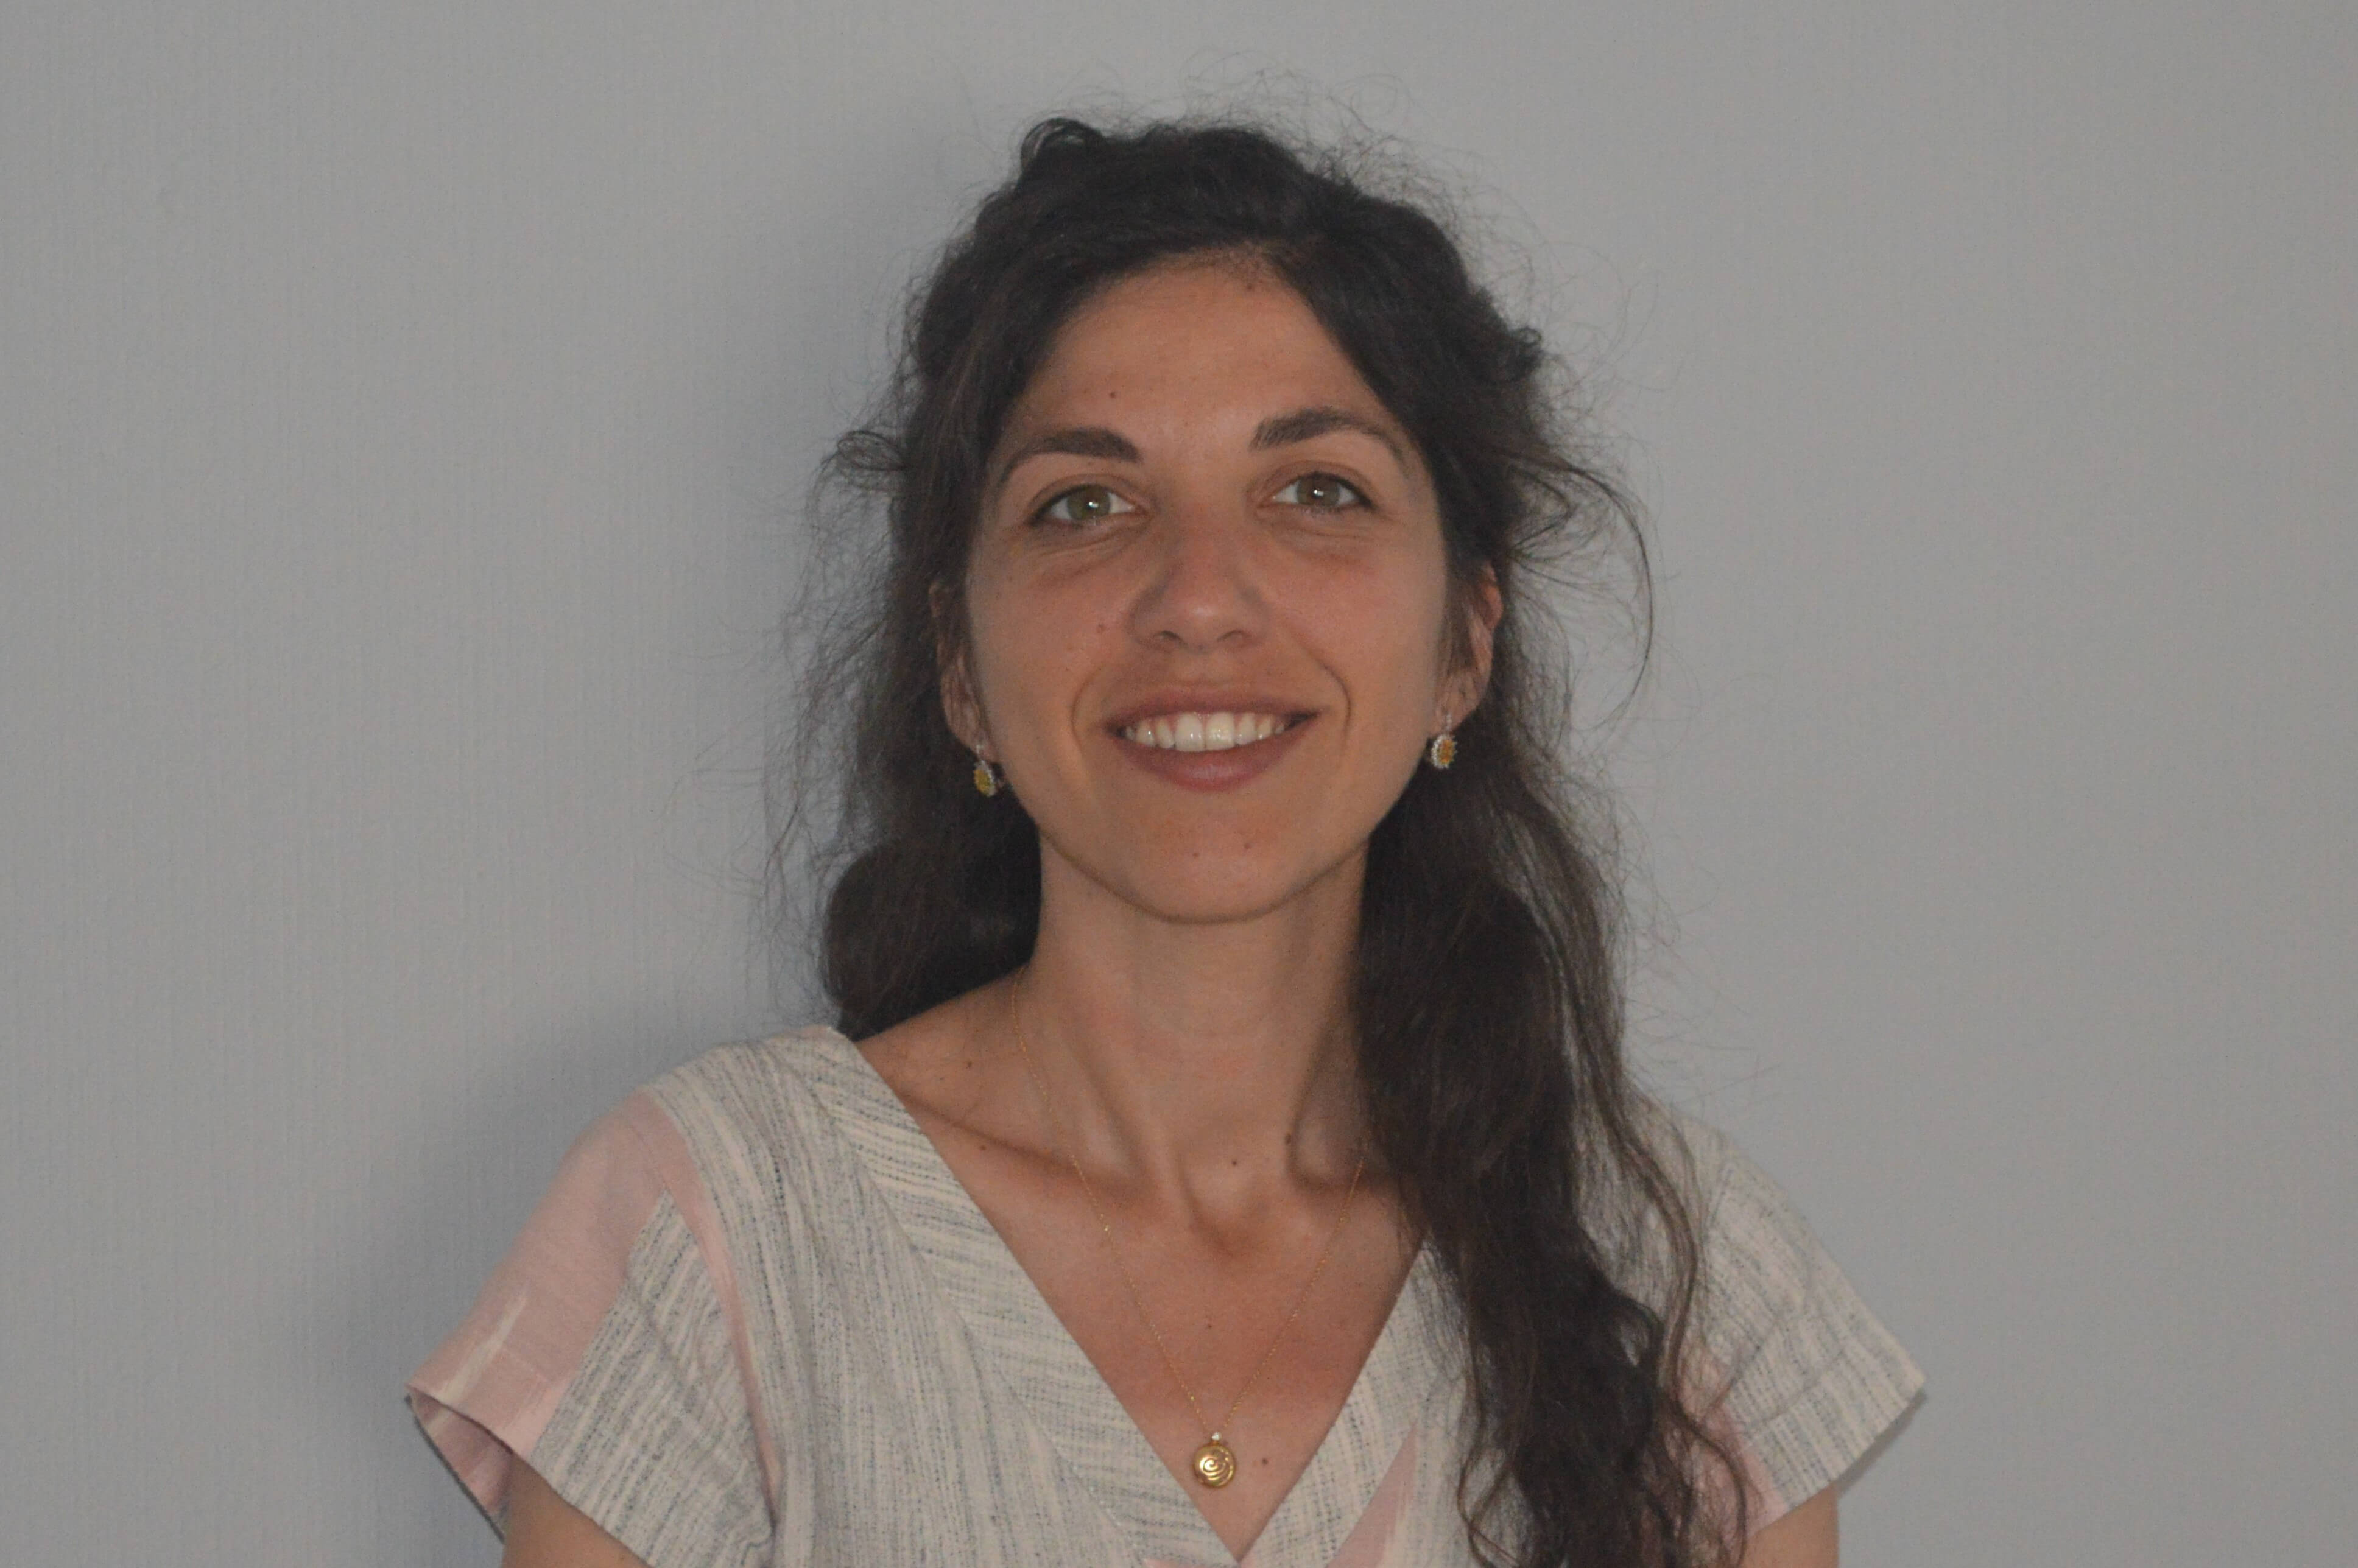 Diletta Guidi, historienne de l'art, politiste